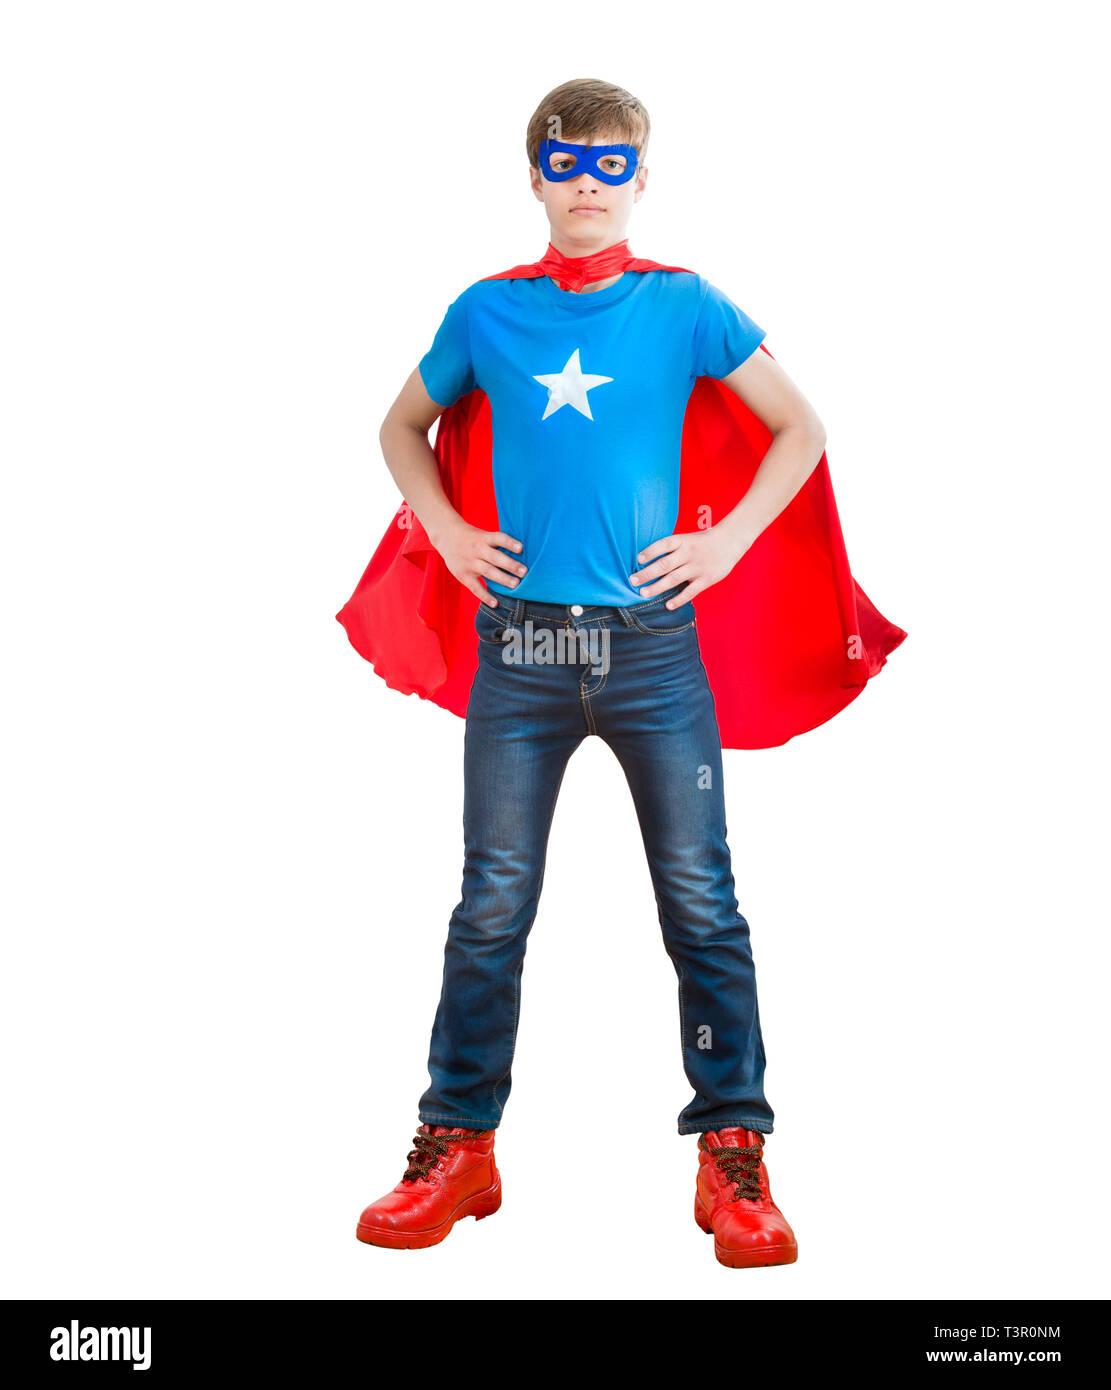 boy acting like a super hero - Stock Image